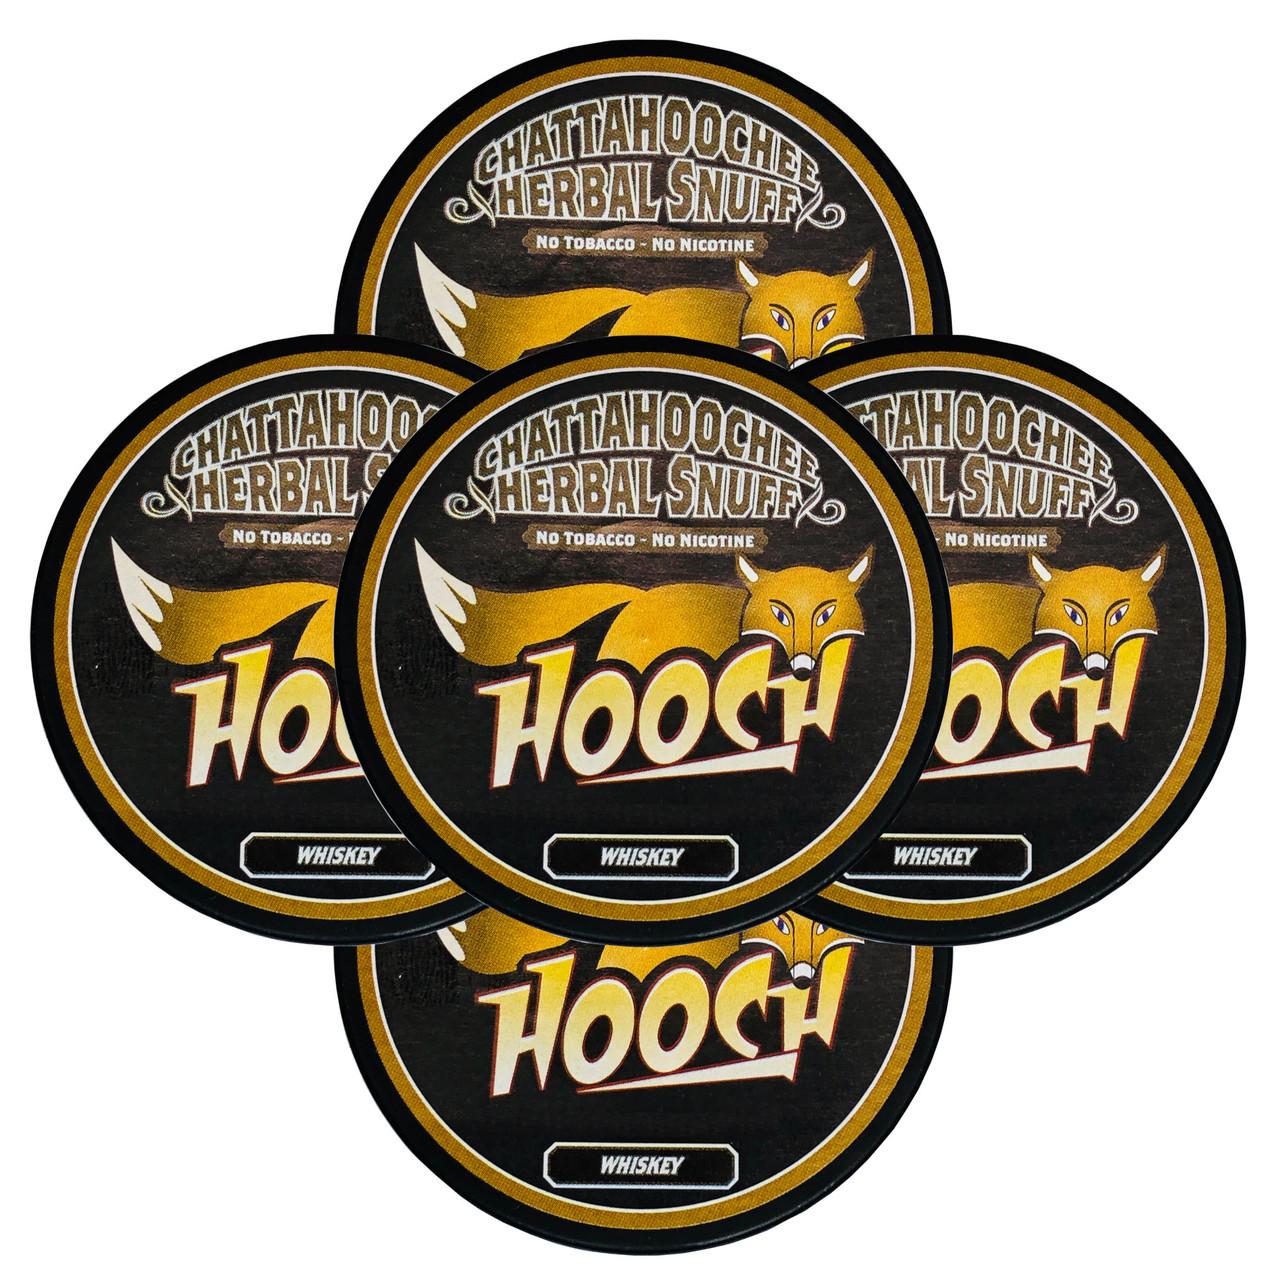 Hooch Snuff 5 Cans Whiskey